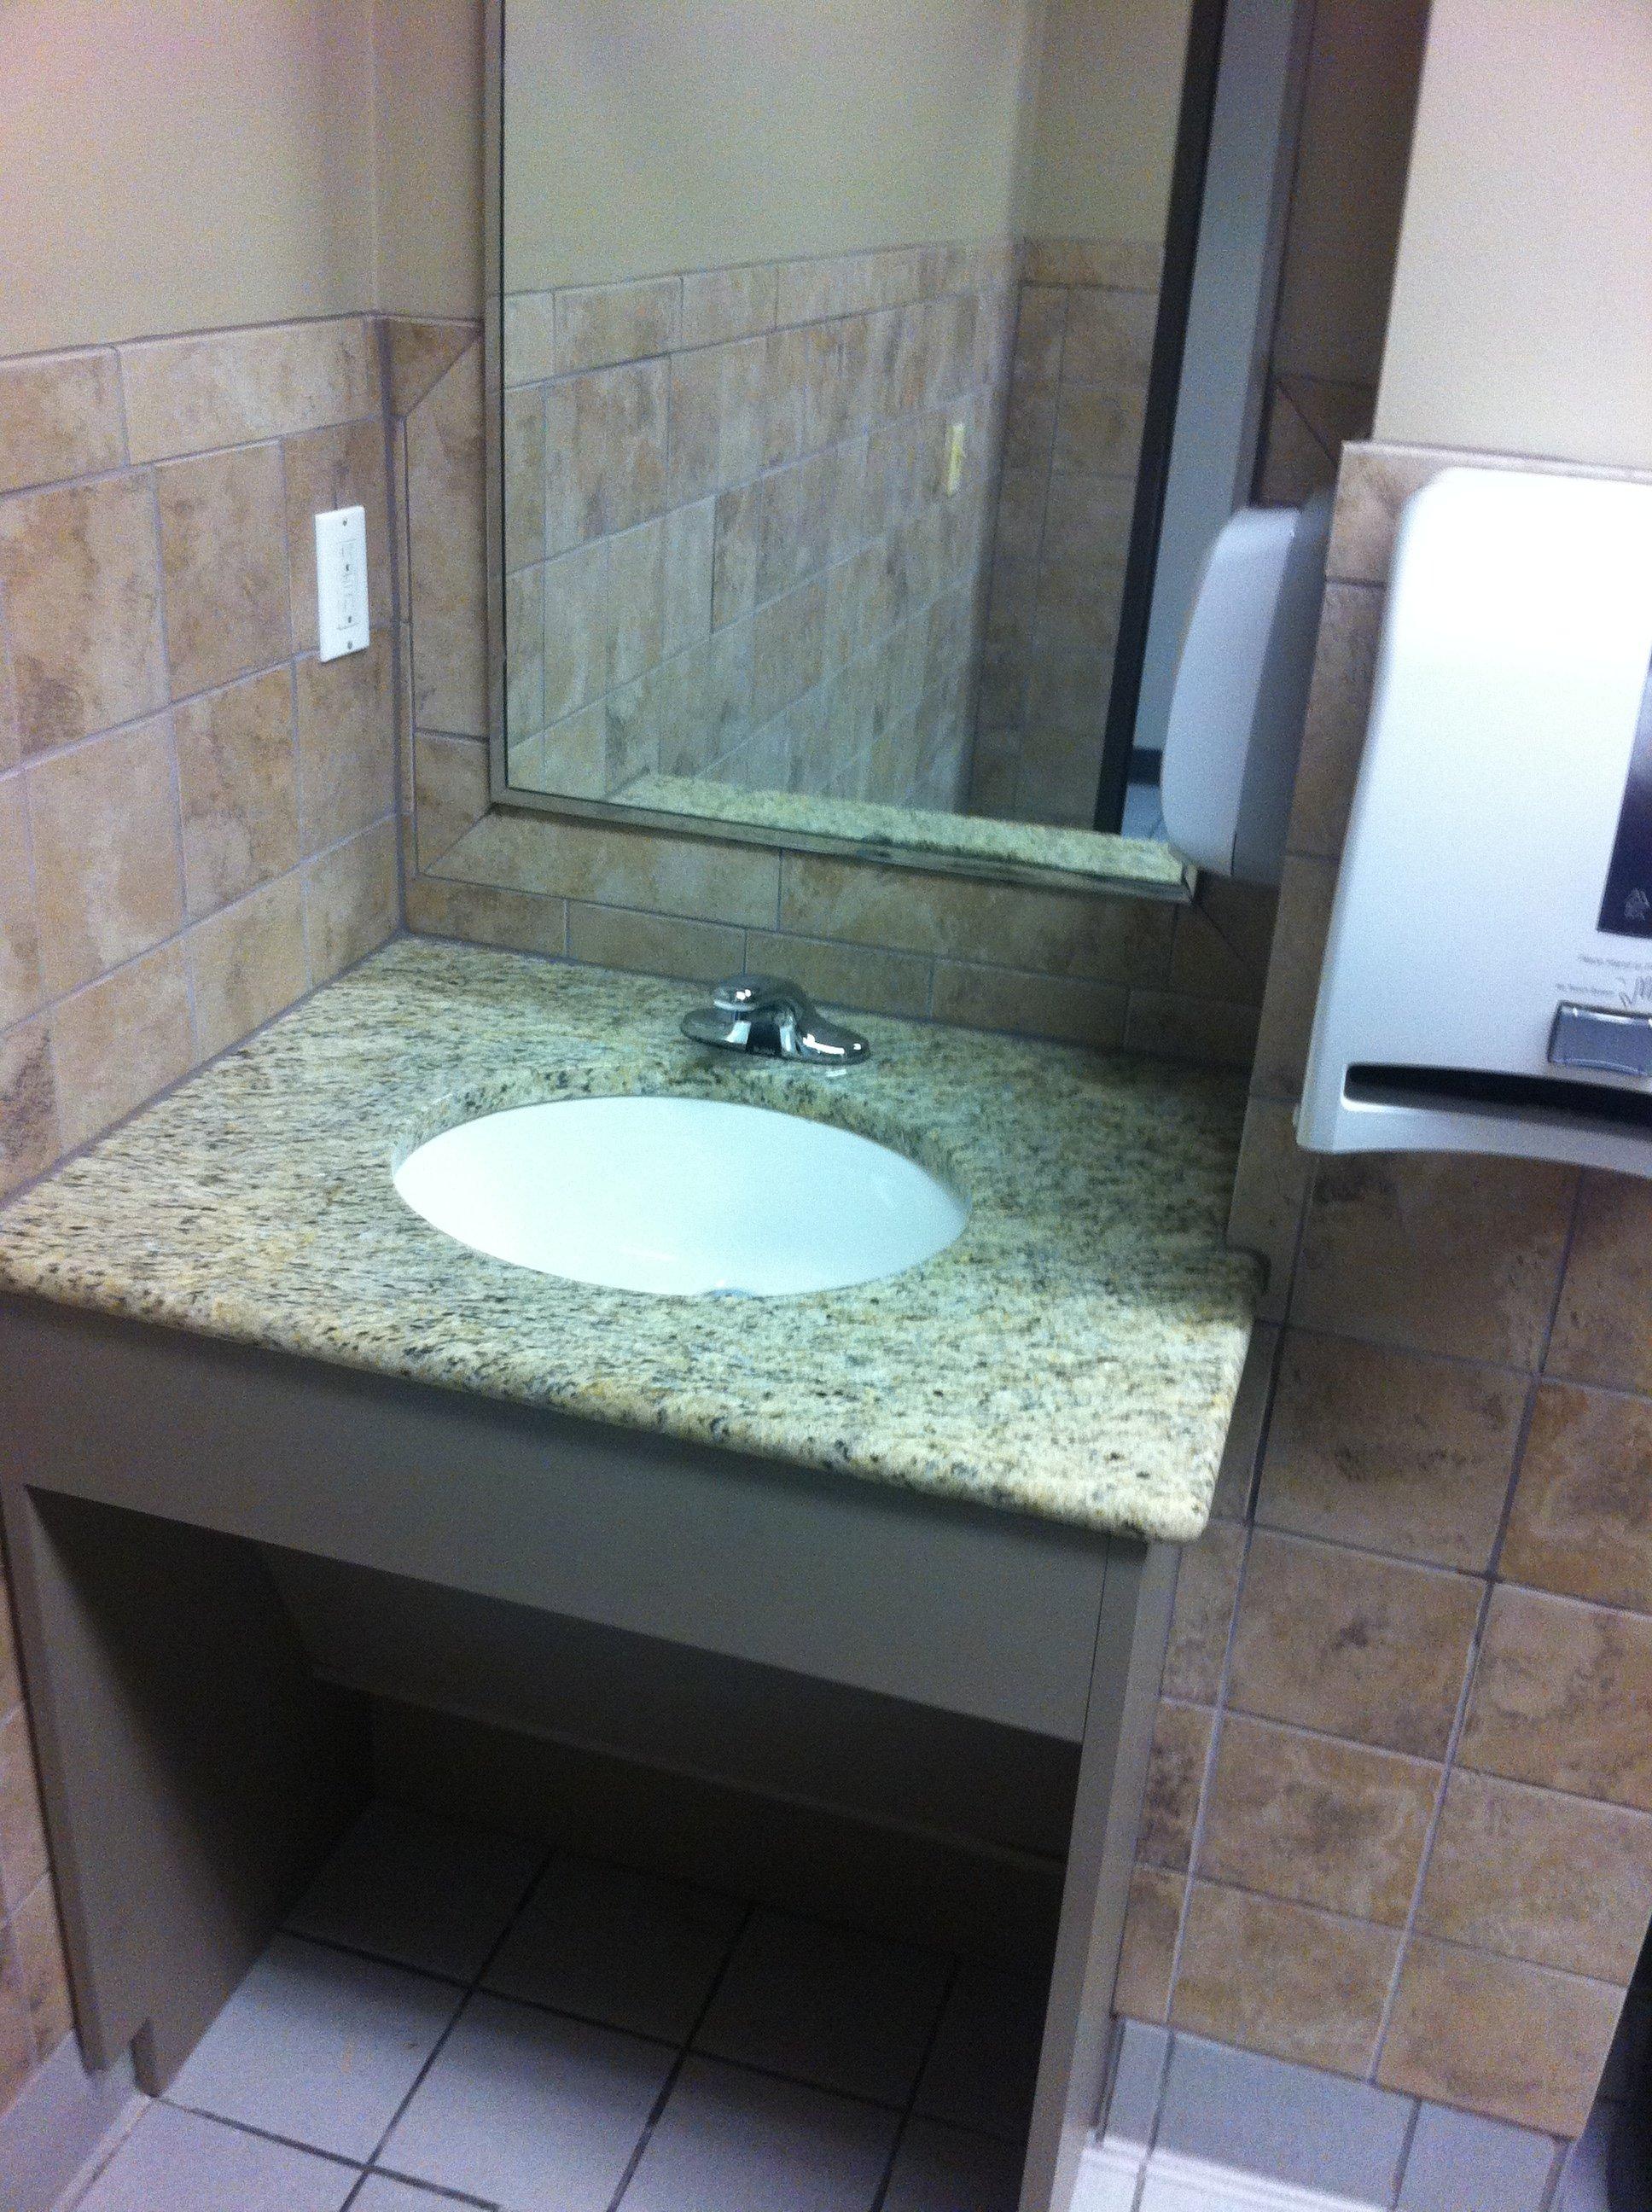 Bathroom Fixtures Austin commercial bathroom upgrades in austin, texas